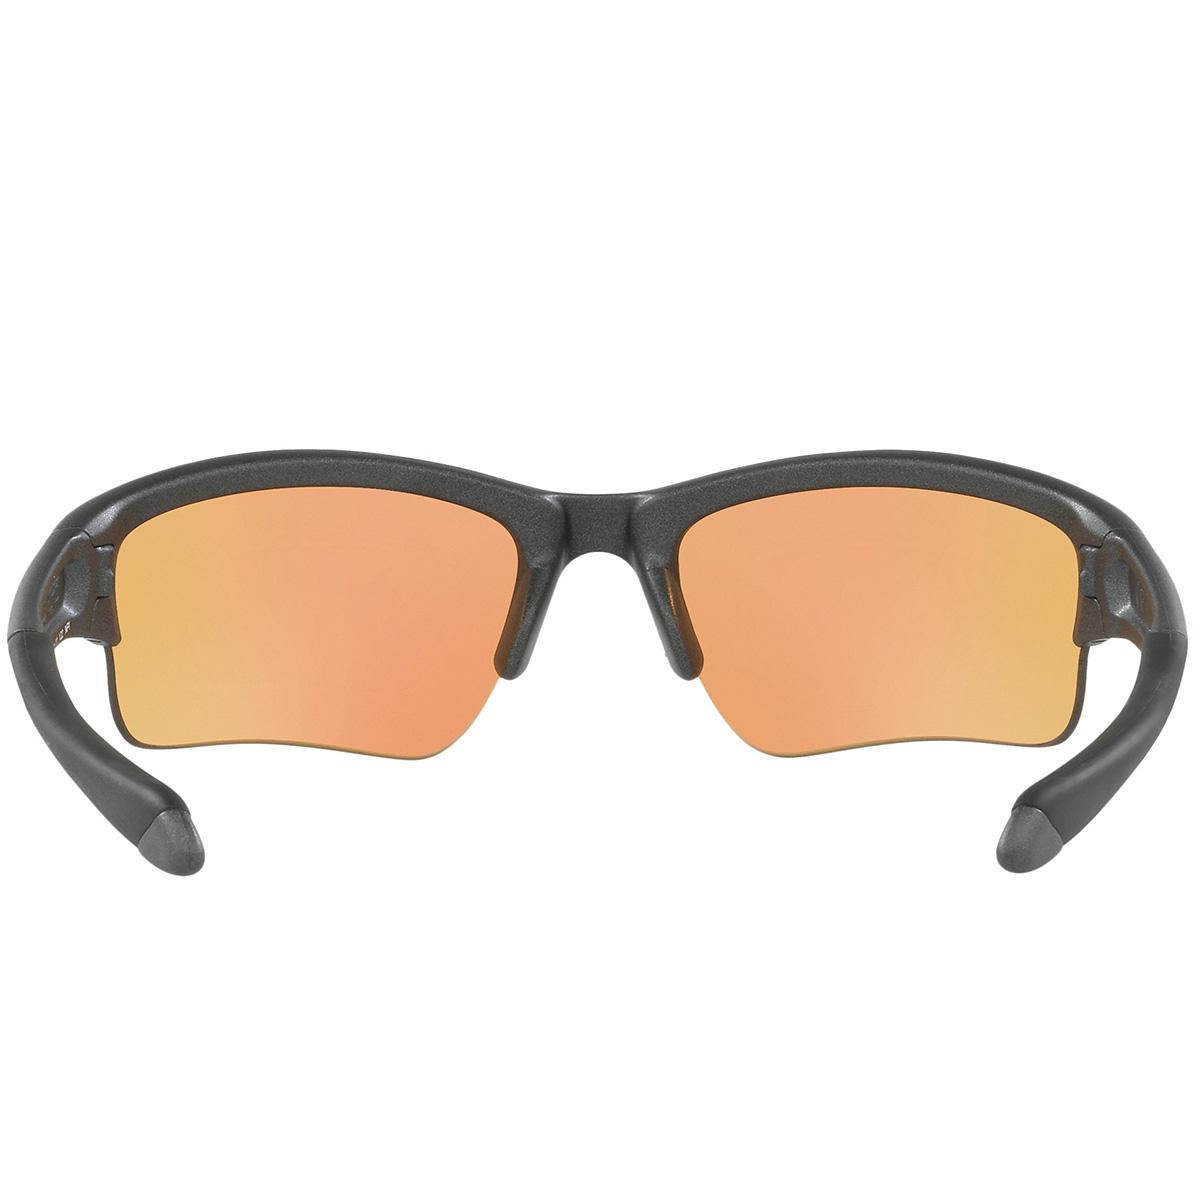 1875c47d79d ... free shipping ottica sm e861e 41a16  canada oakley quarter jacket prizm  junior sunglasses. oakley quarter jacket ead01 fd800